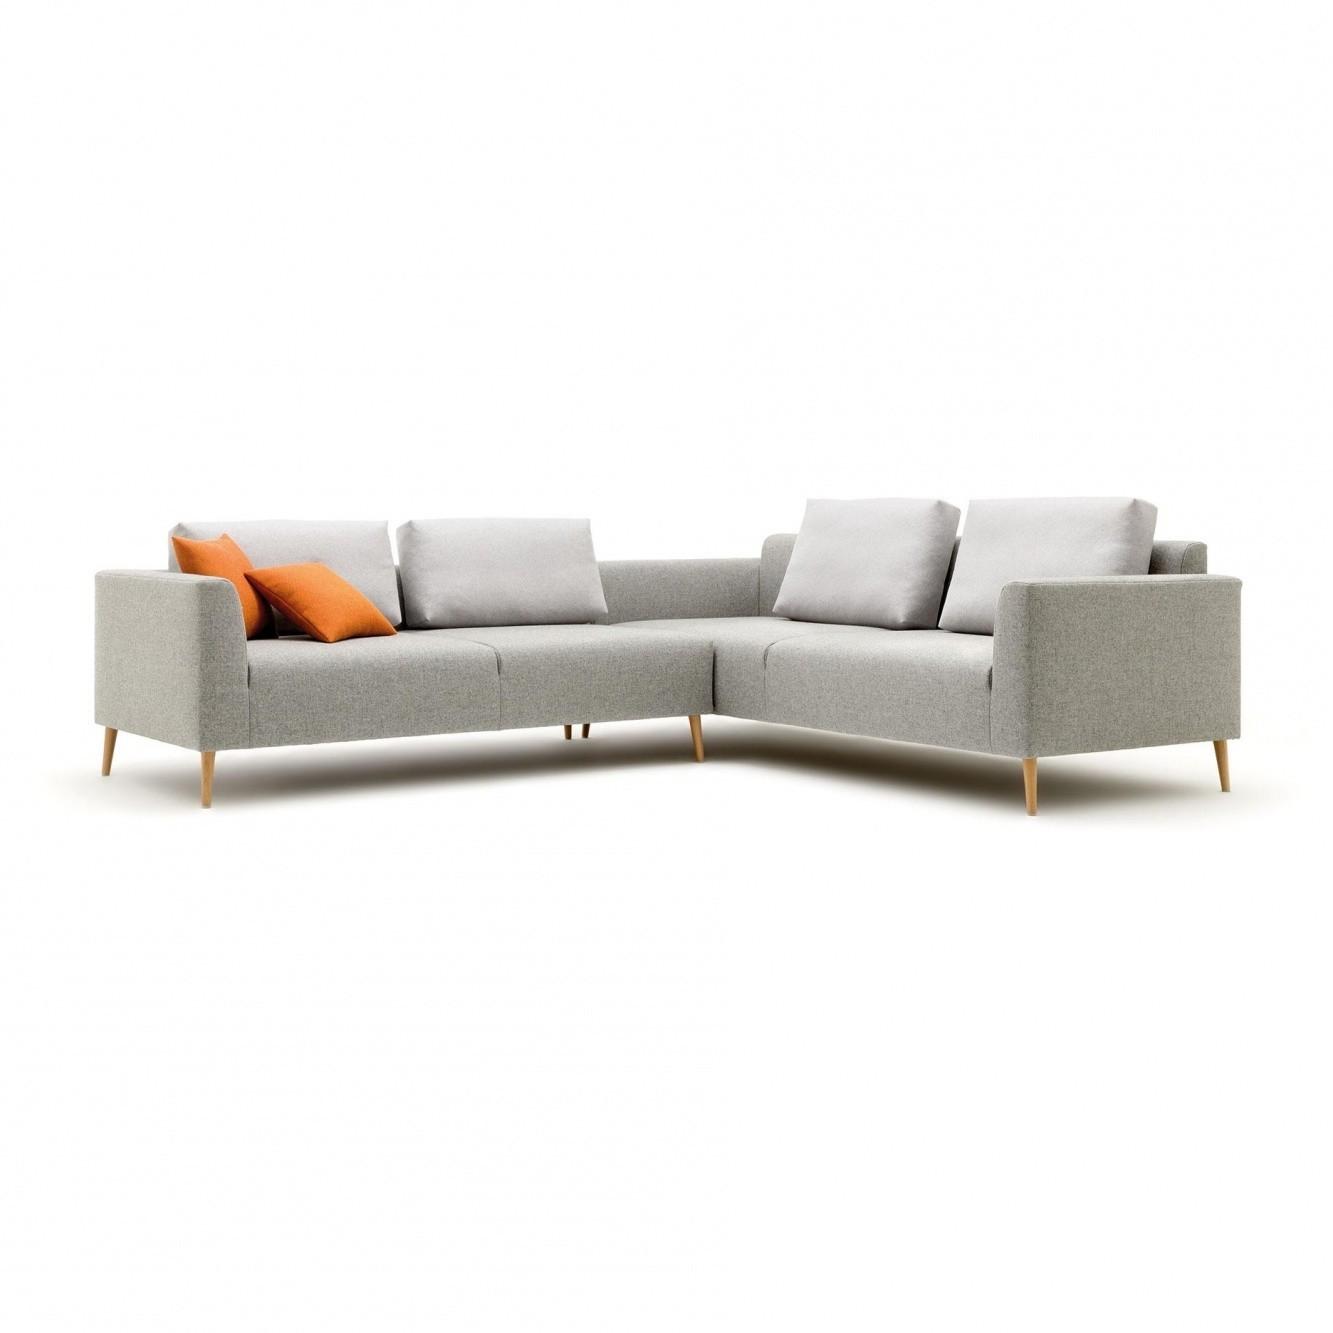 rolf benz freistil sofa no 180 chair and covers uk 162 ambientedirect 289x232cm telegrey light frame oak fabric